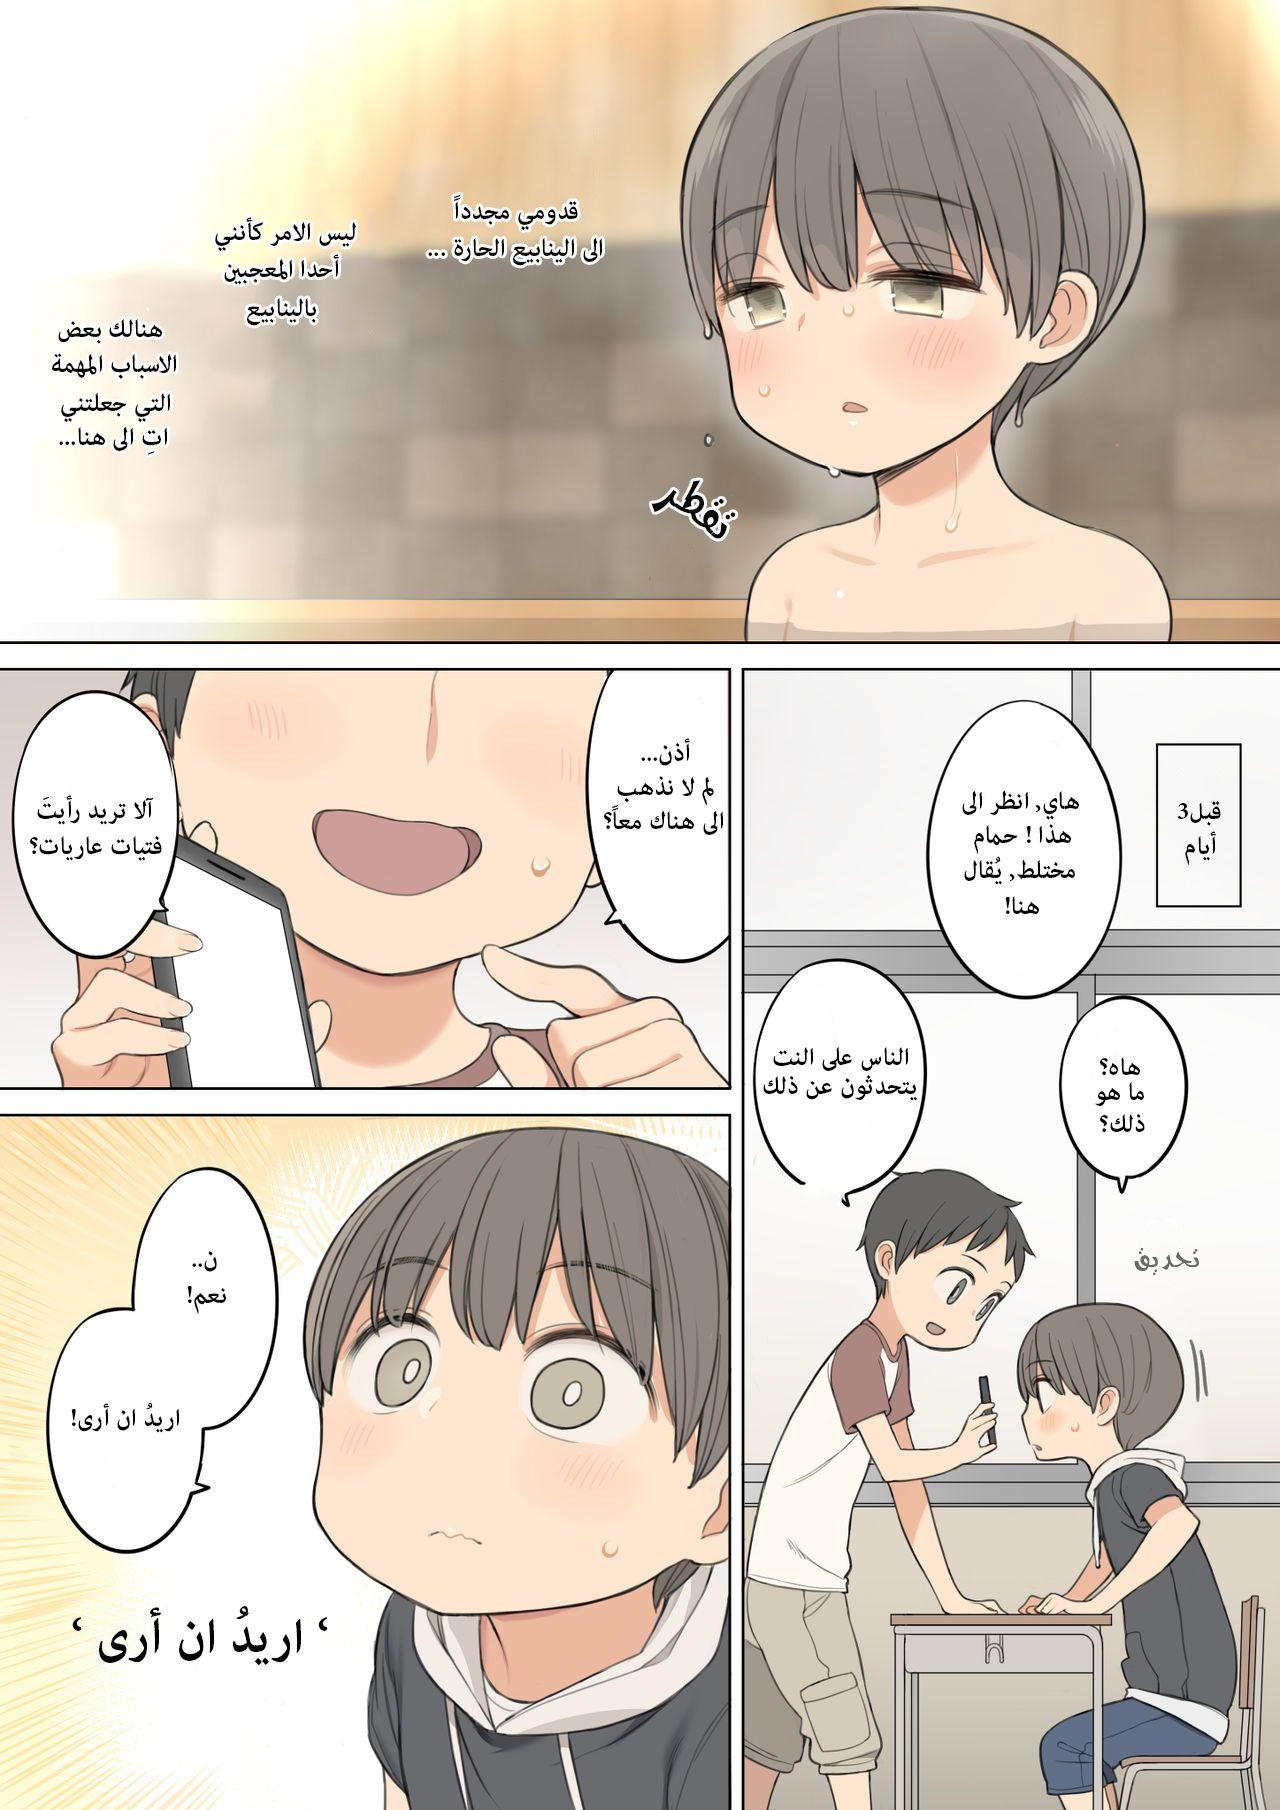 Konyoku Onsen de Toshiue no Onee-san ni Ippai Shasei Sasete Morau Hanashi | Story of how I came a lot with an older oneesan at the mixed hot spring bath 1